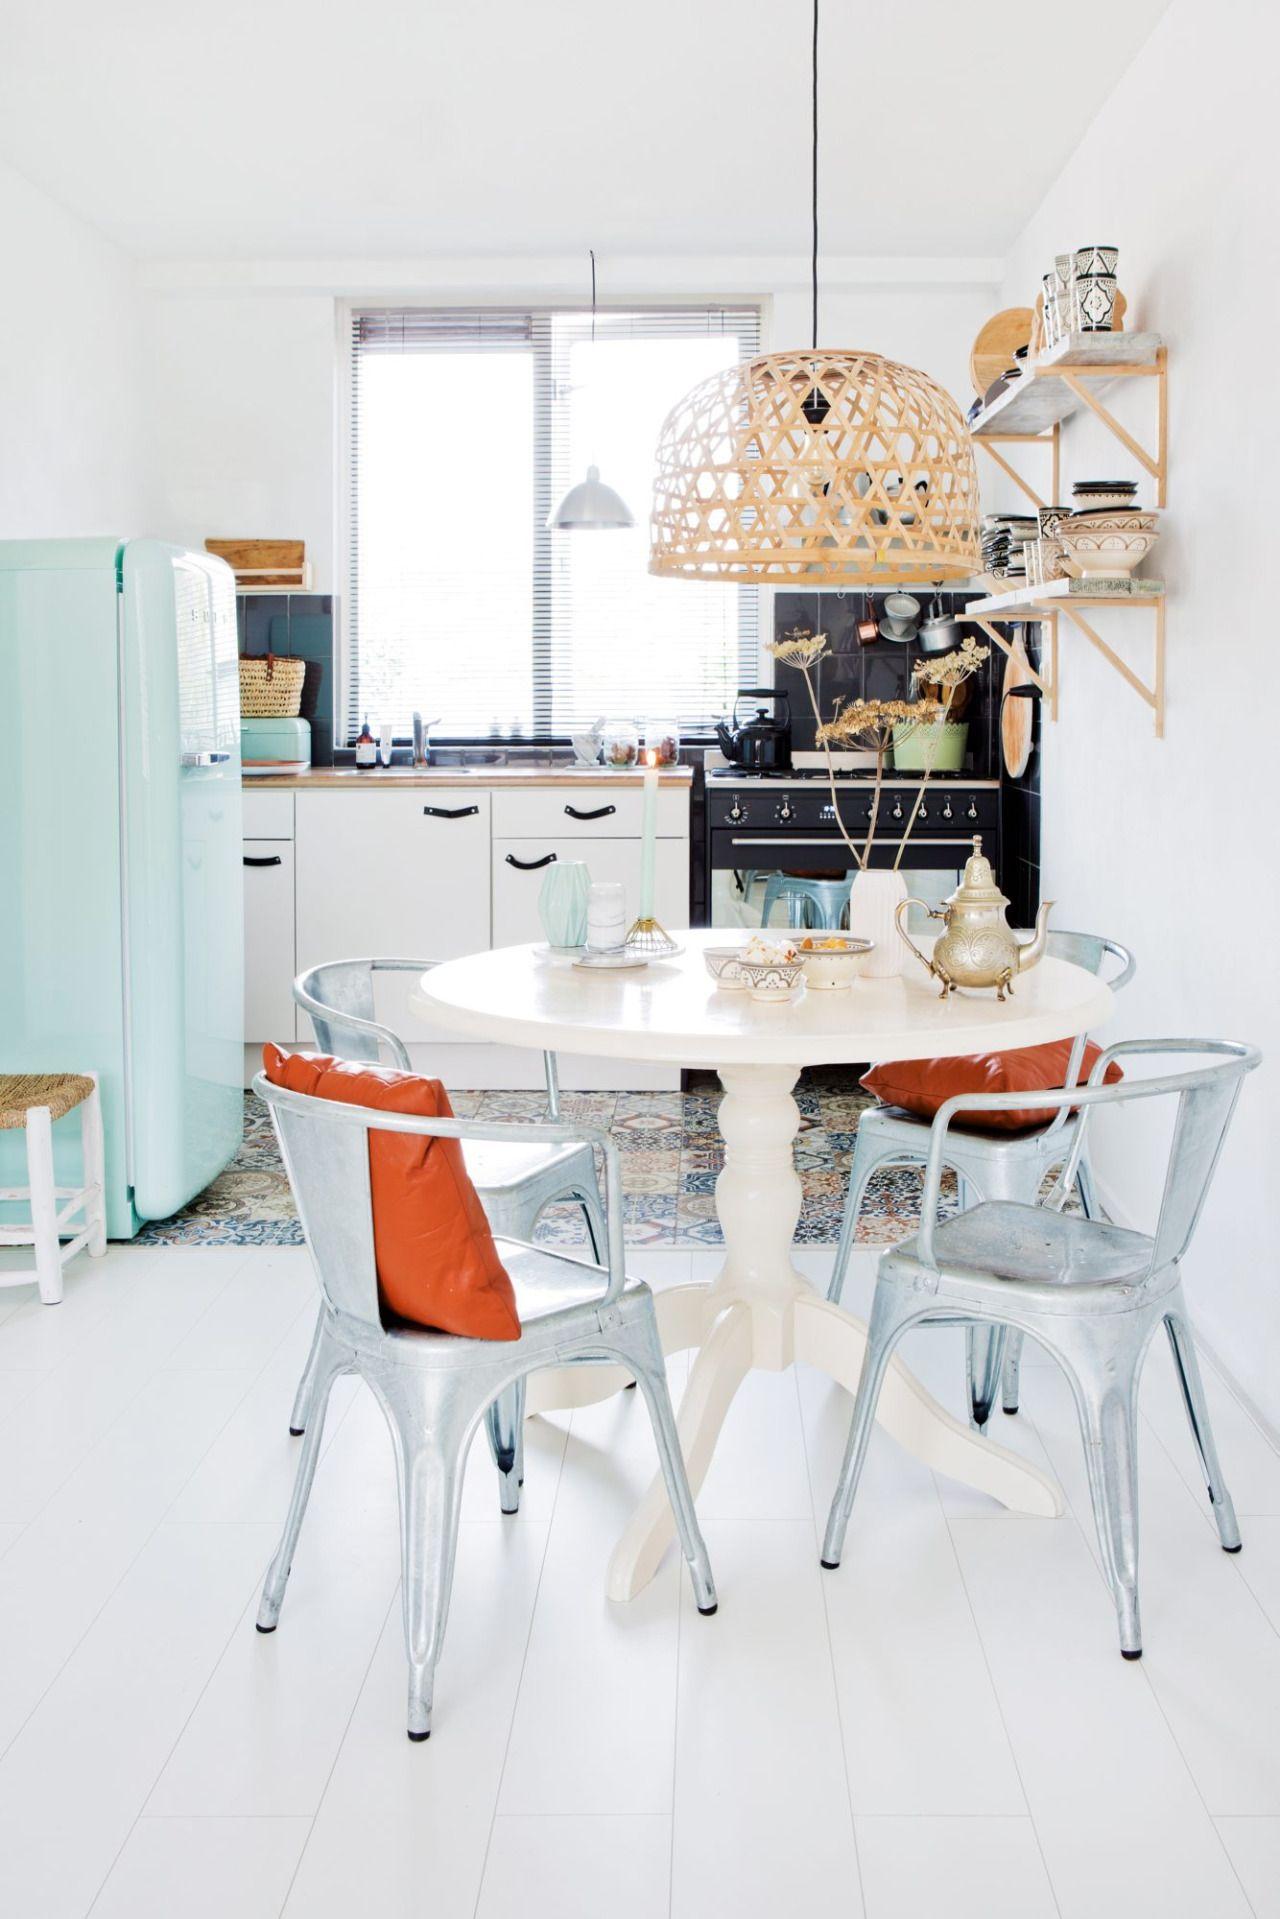 Light Home in Scandinavian and Moroccan style gravityhomeblog.com ...